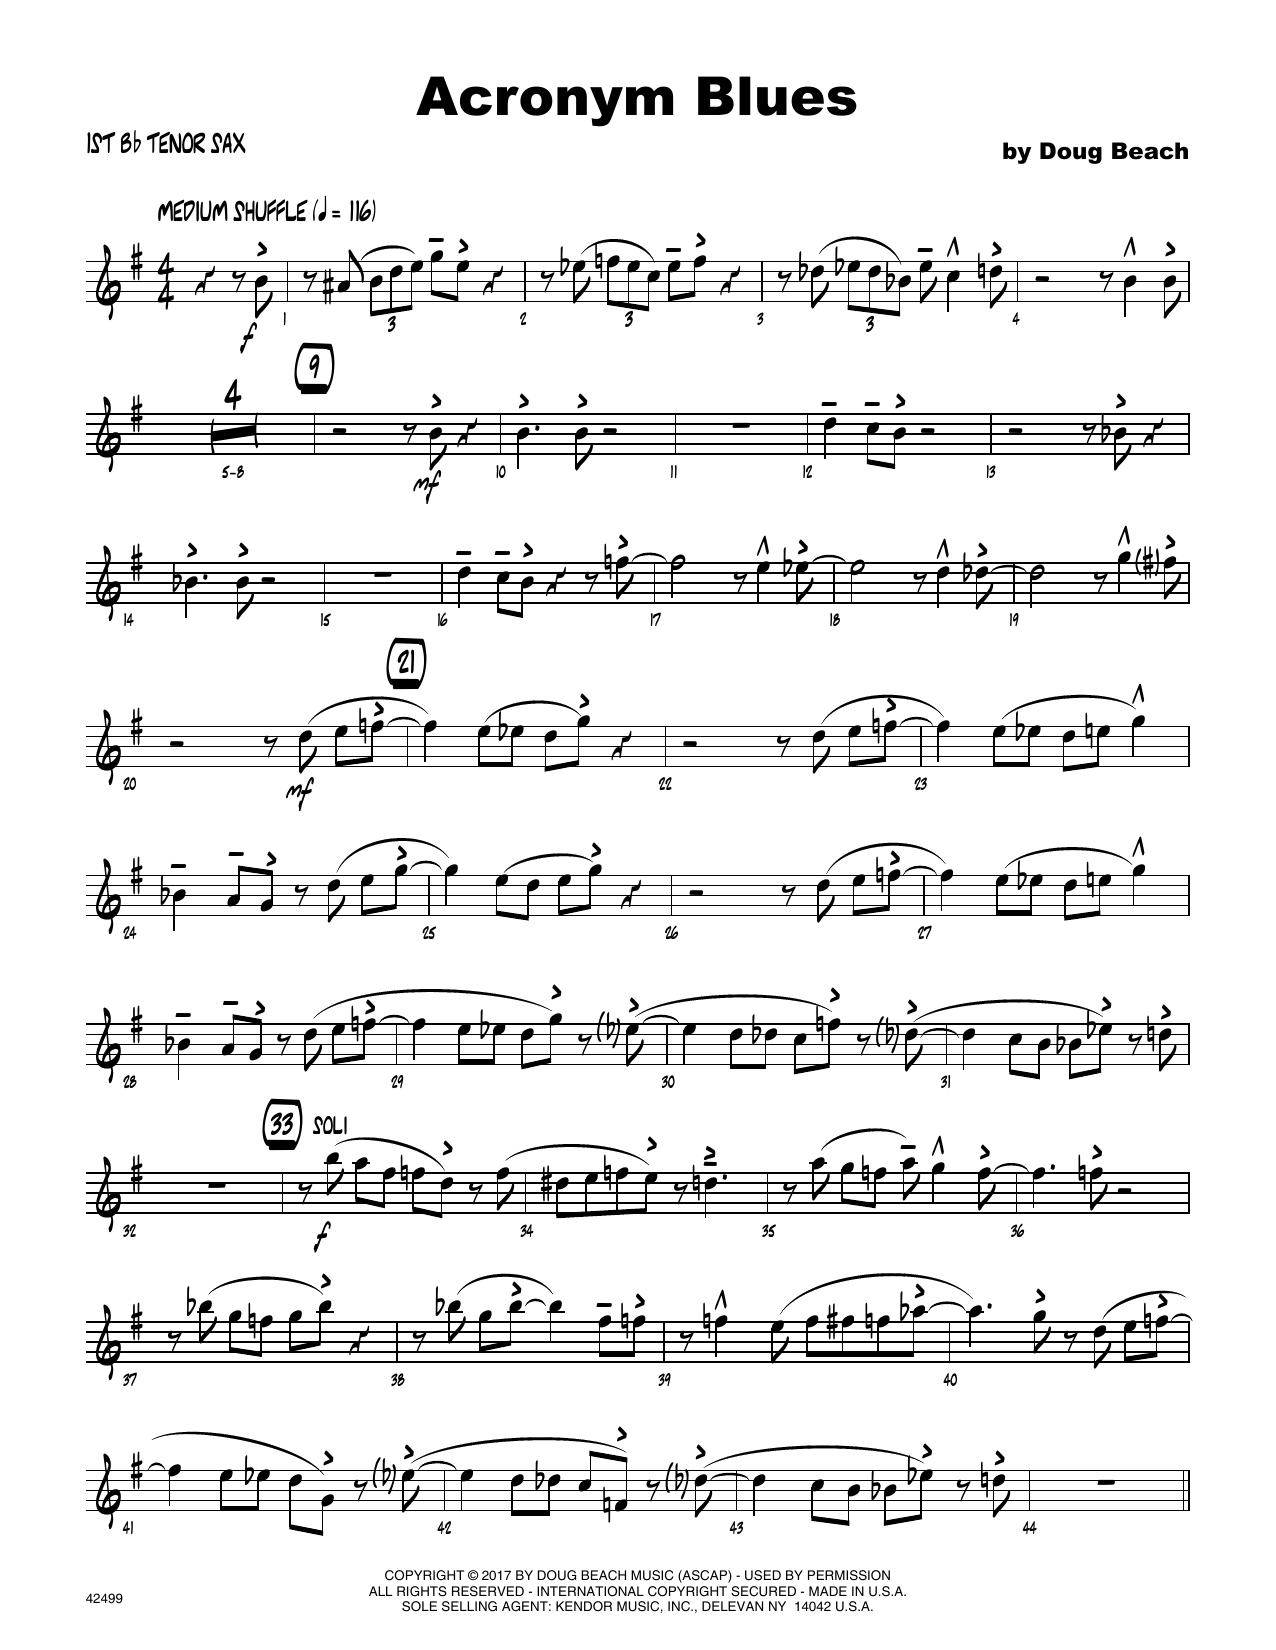 Acronym Blues - 1st Tenor Saxophone Sheet Music